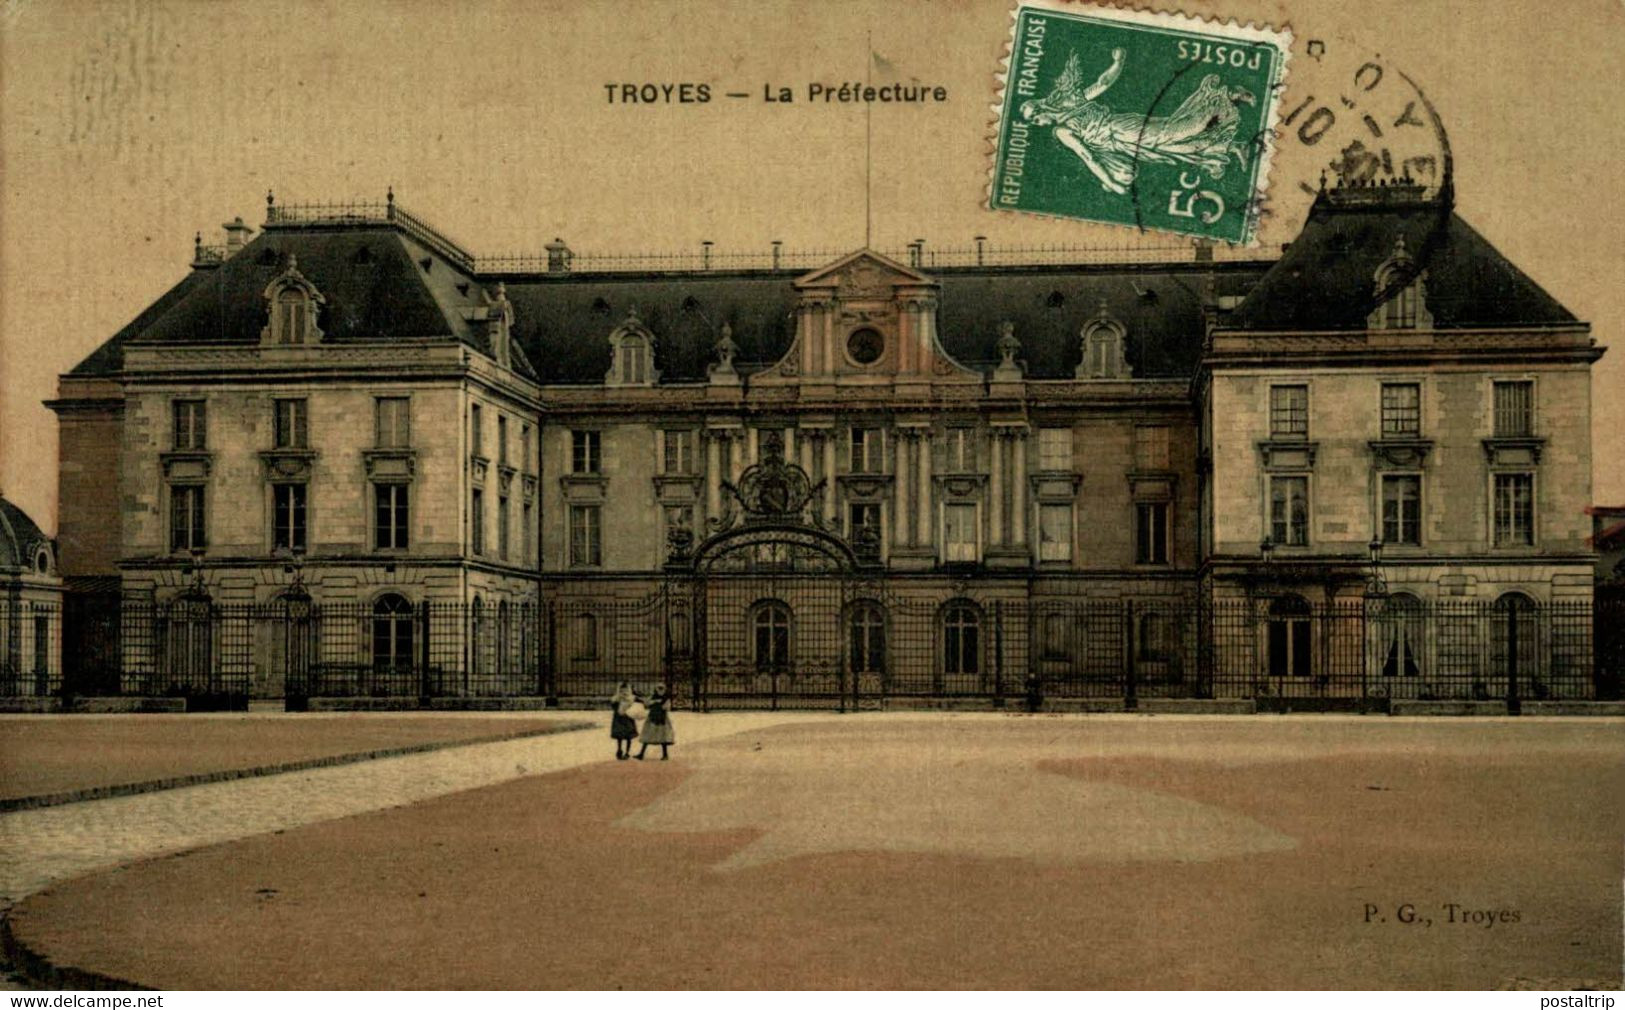 Troyes  La Préfecture  10Aube France Frankrijk Francia - Troyes